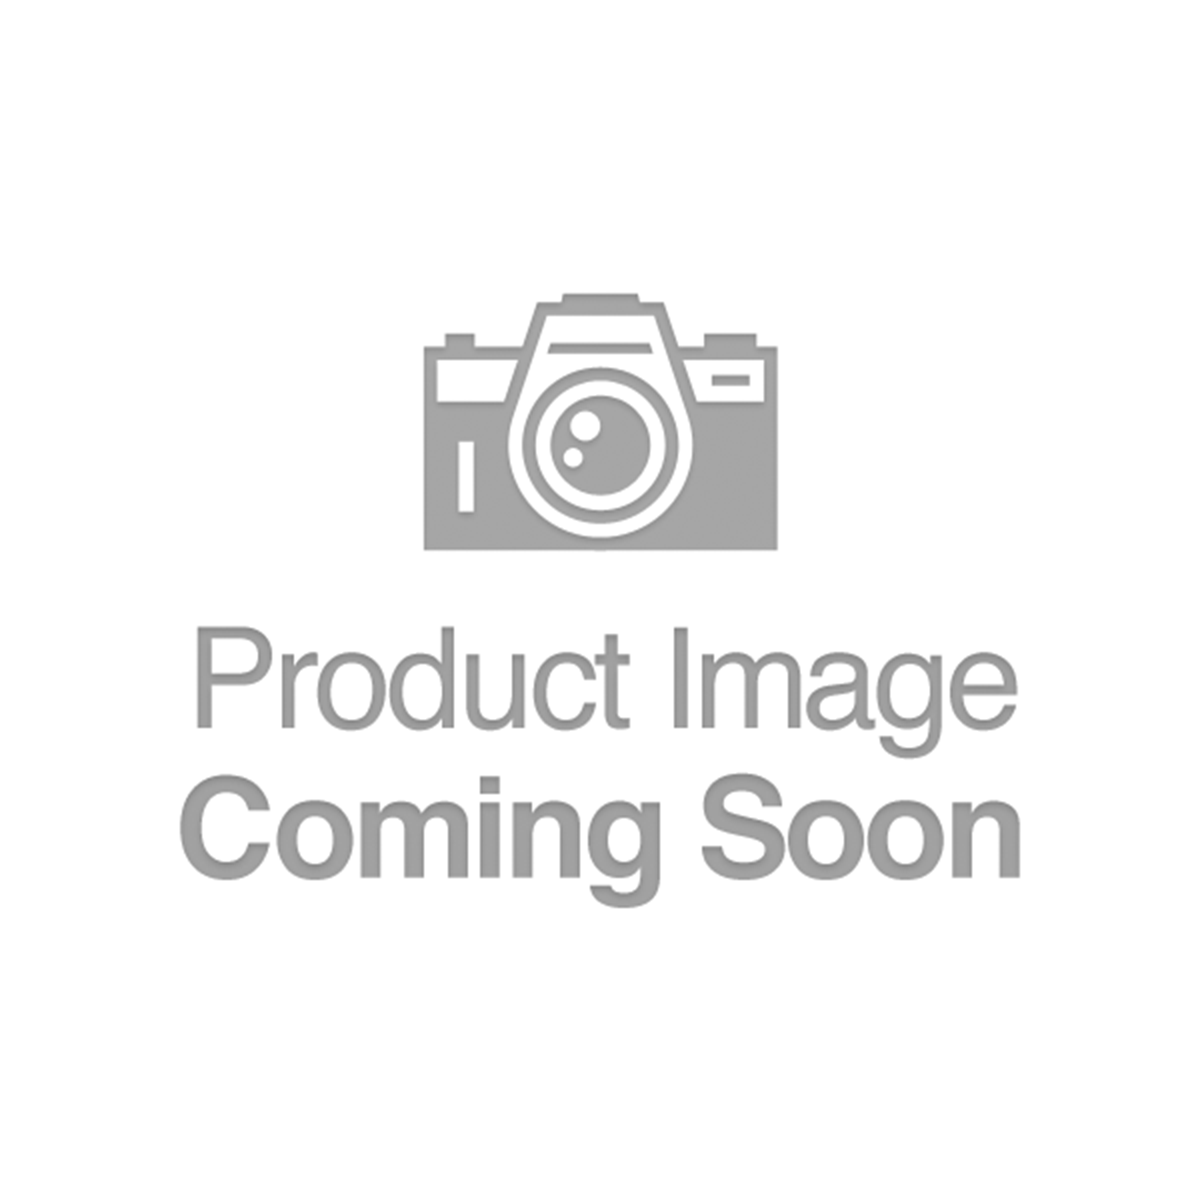 Lebanon - Tennessee - CH 5754 - FR 633 - PMG 15